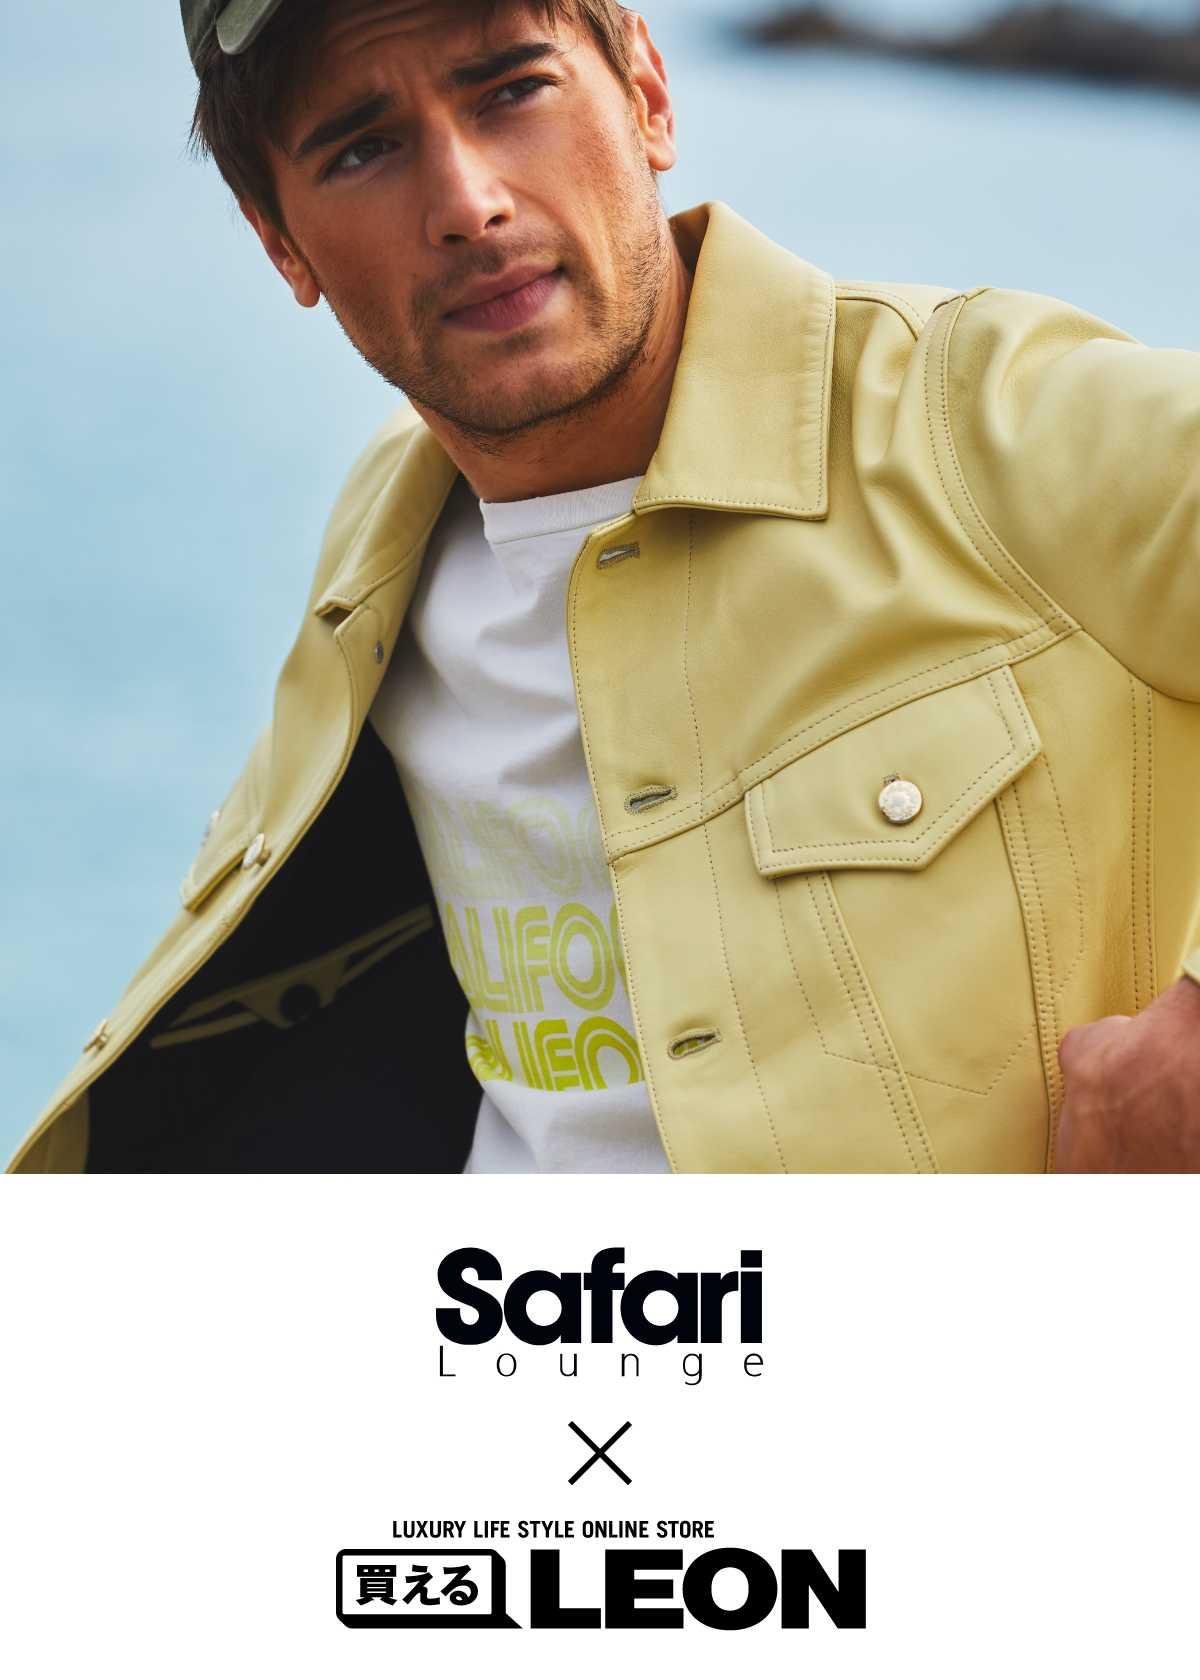 『Safari』と『LEON』が手を組んだ、 夢のコラボが実現!